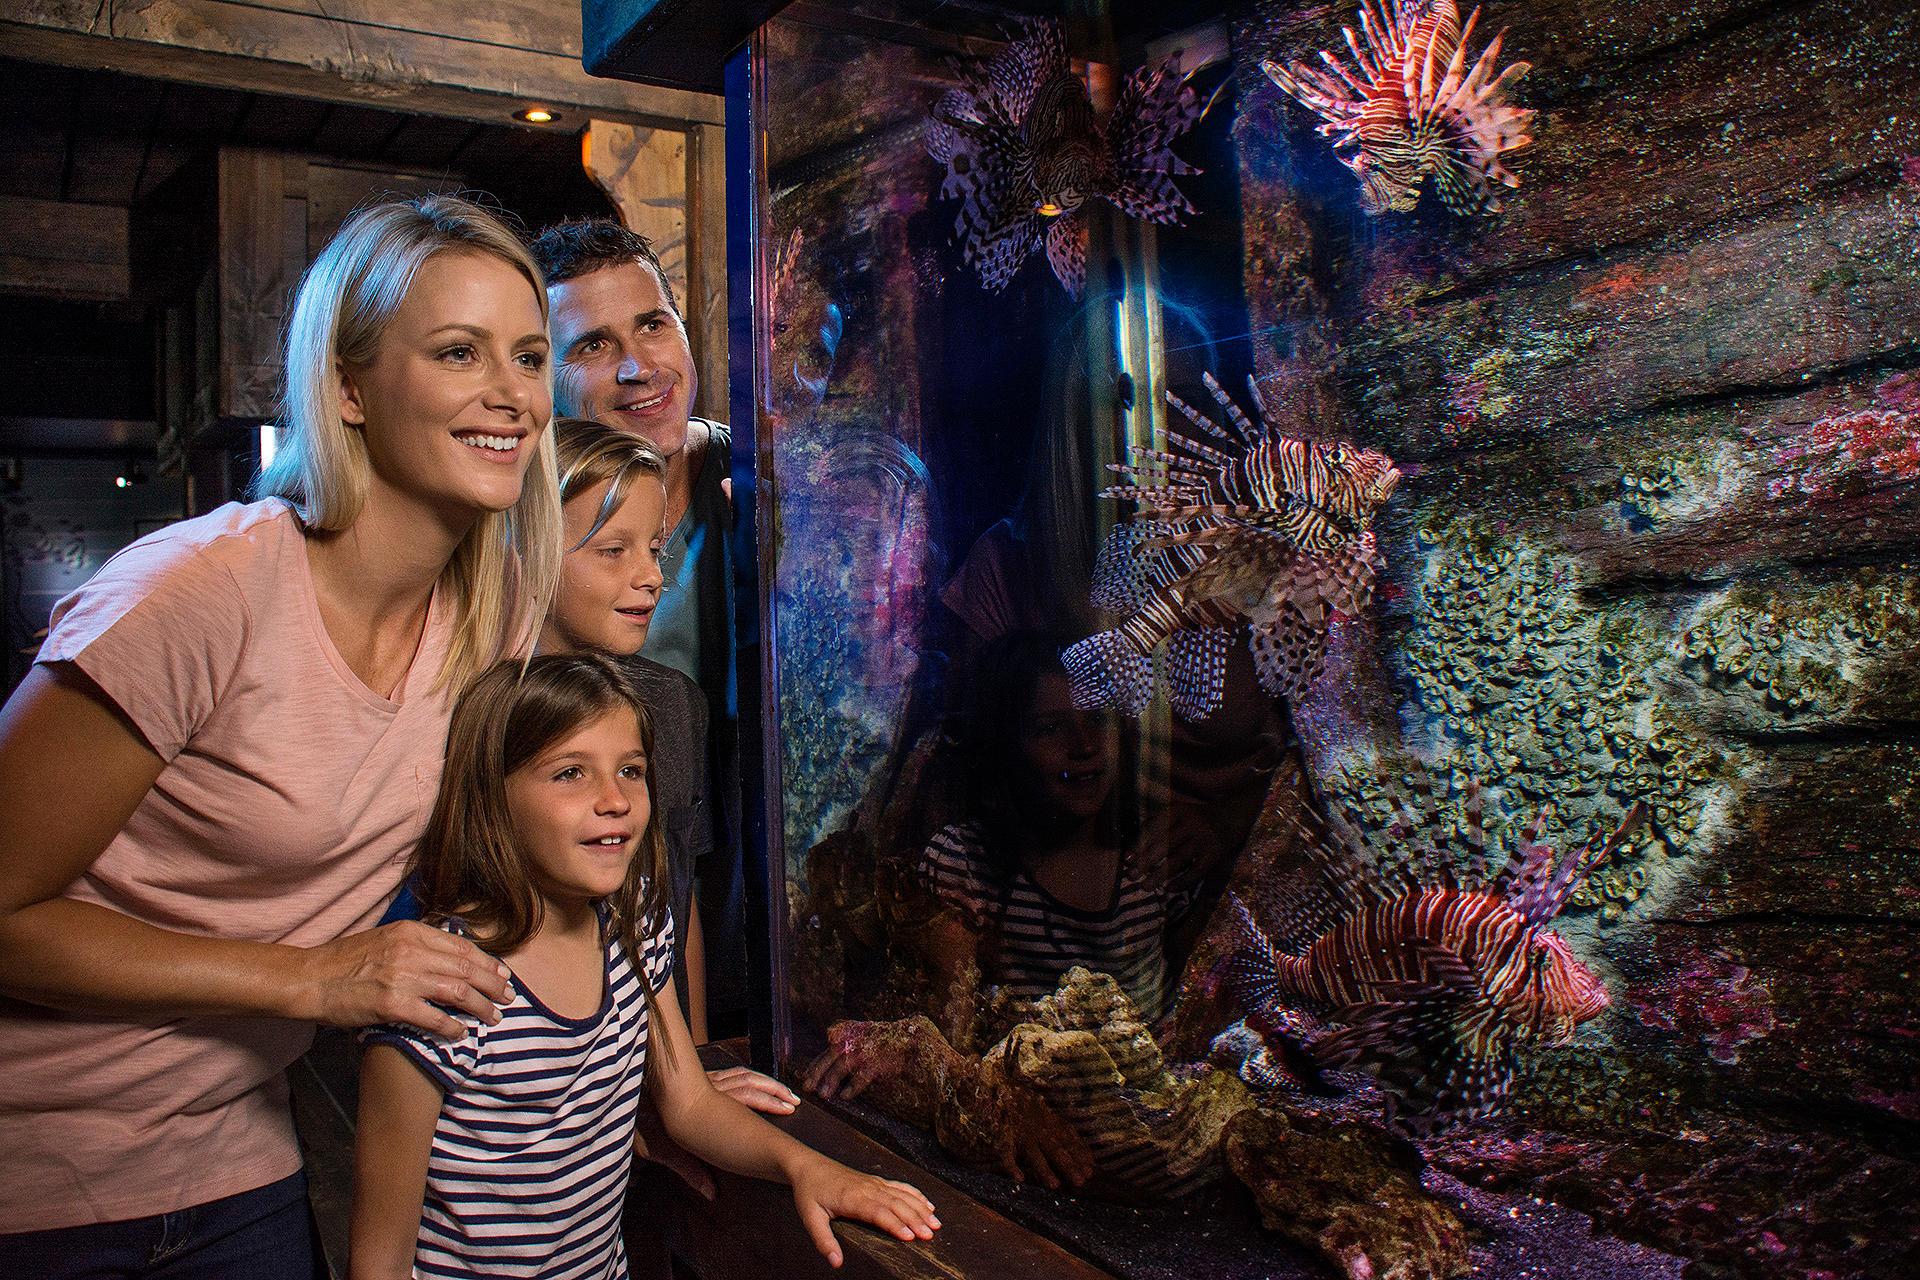 SEA LIFE Sunshine Coast Aquarium